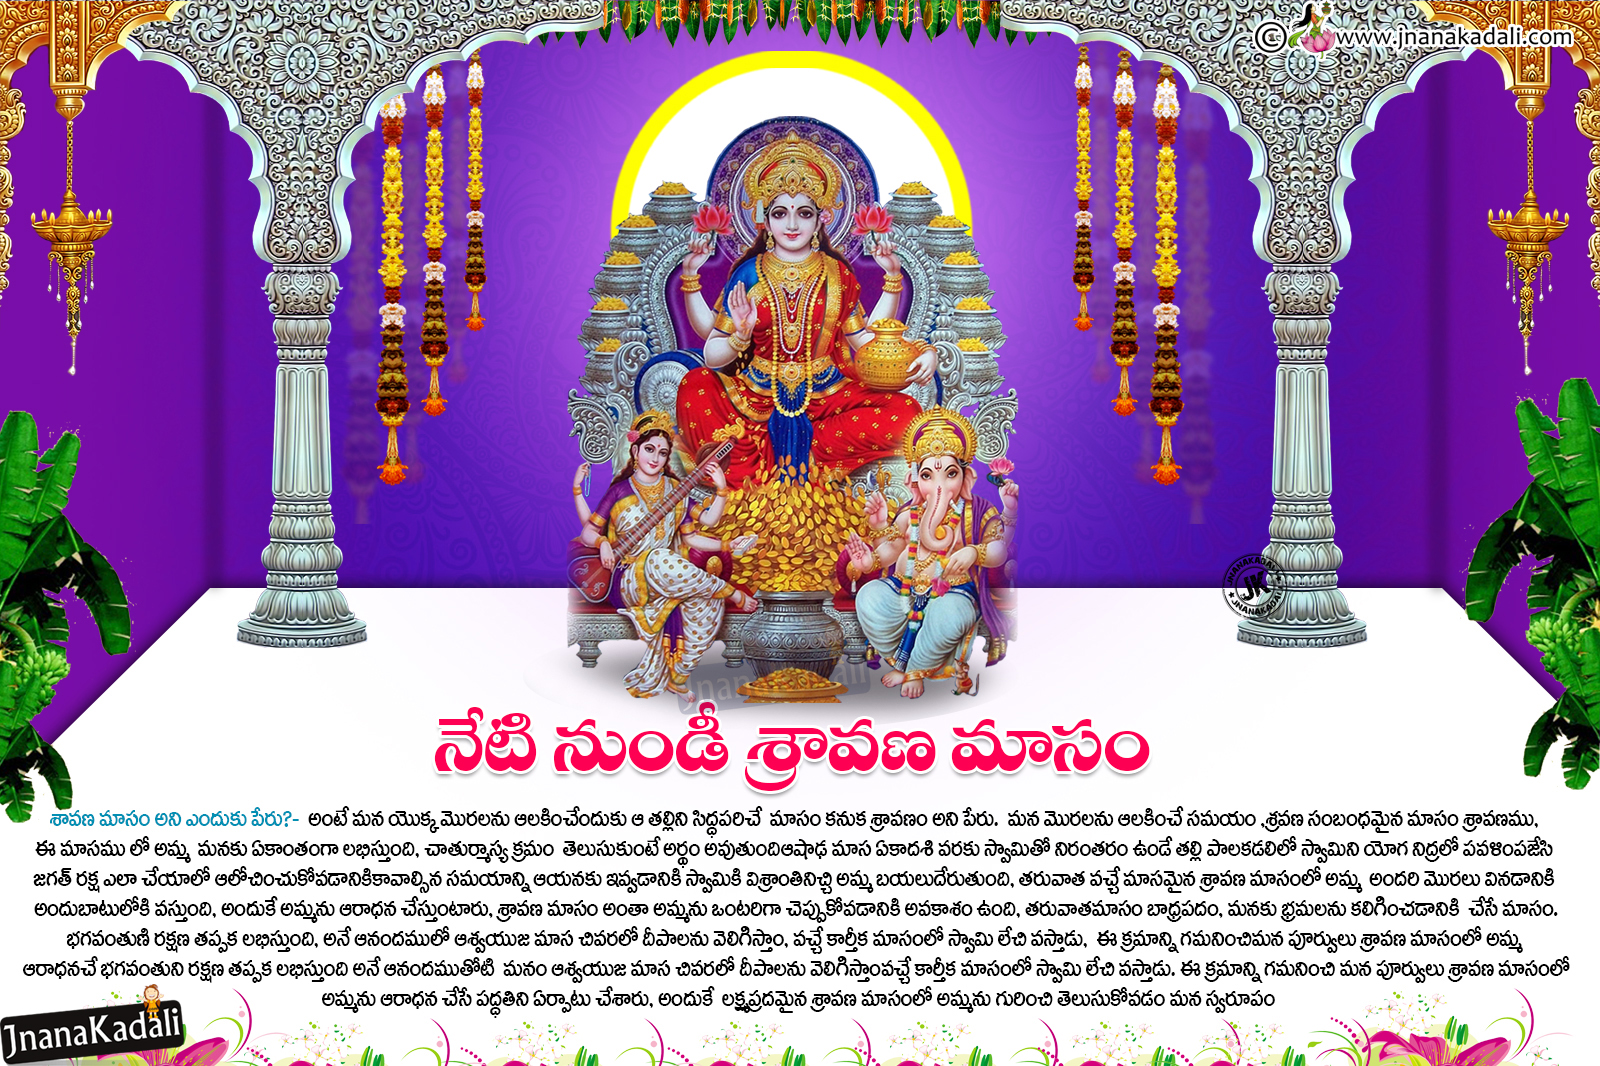 Sravana masam mp3 free download